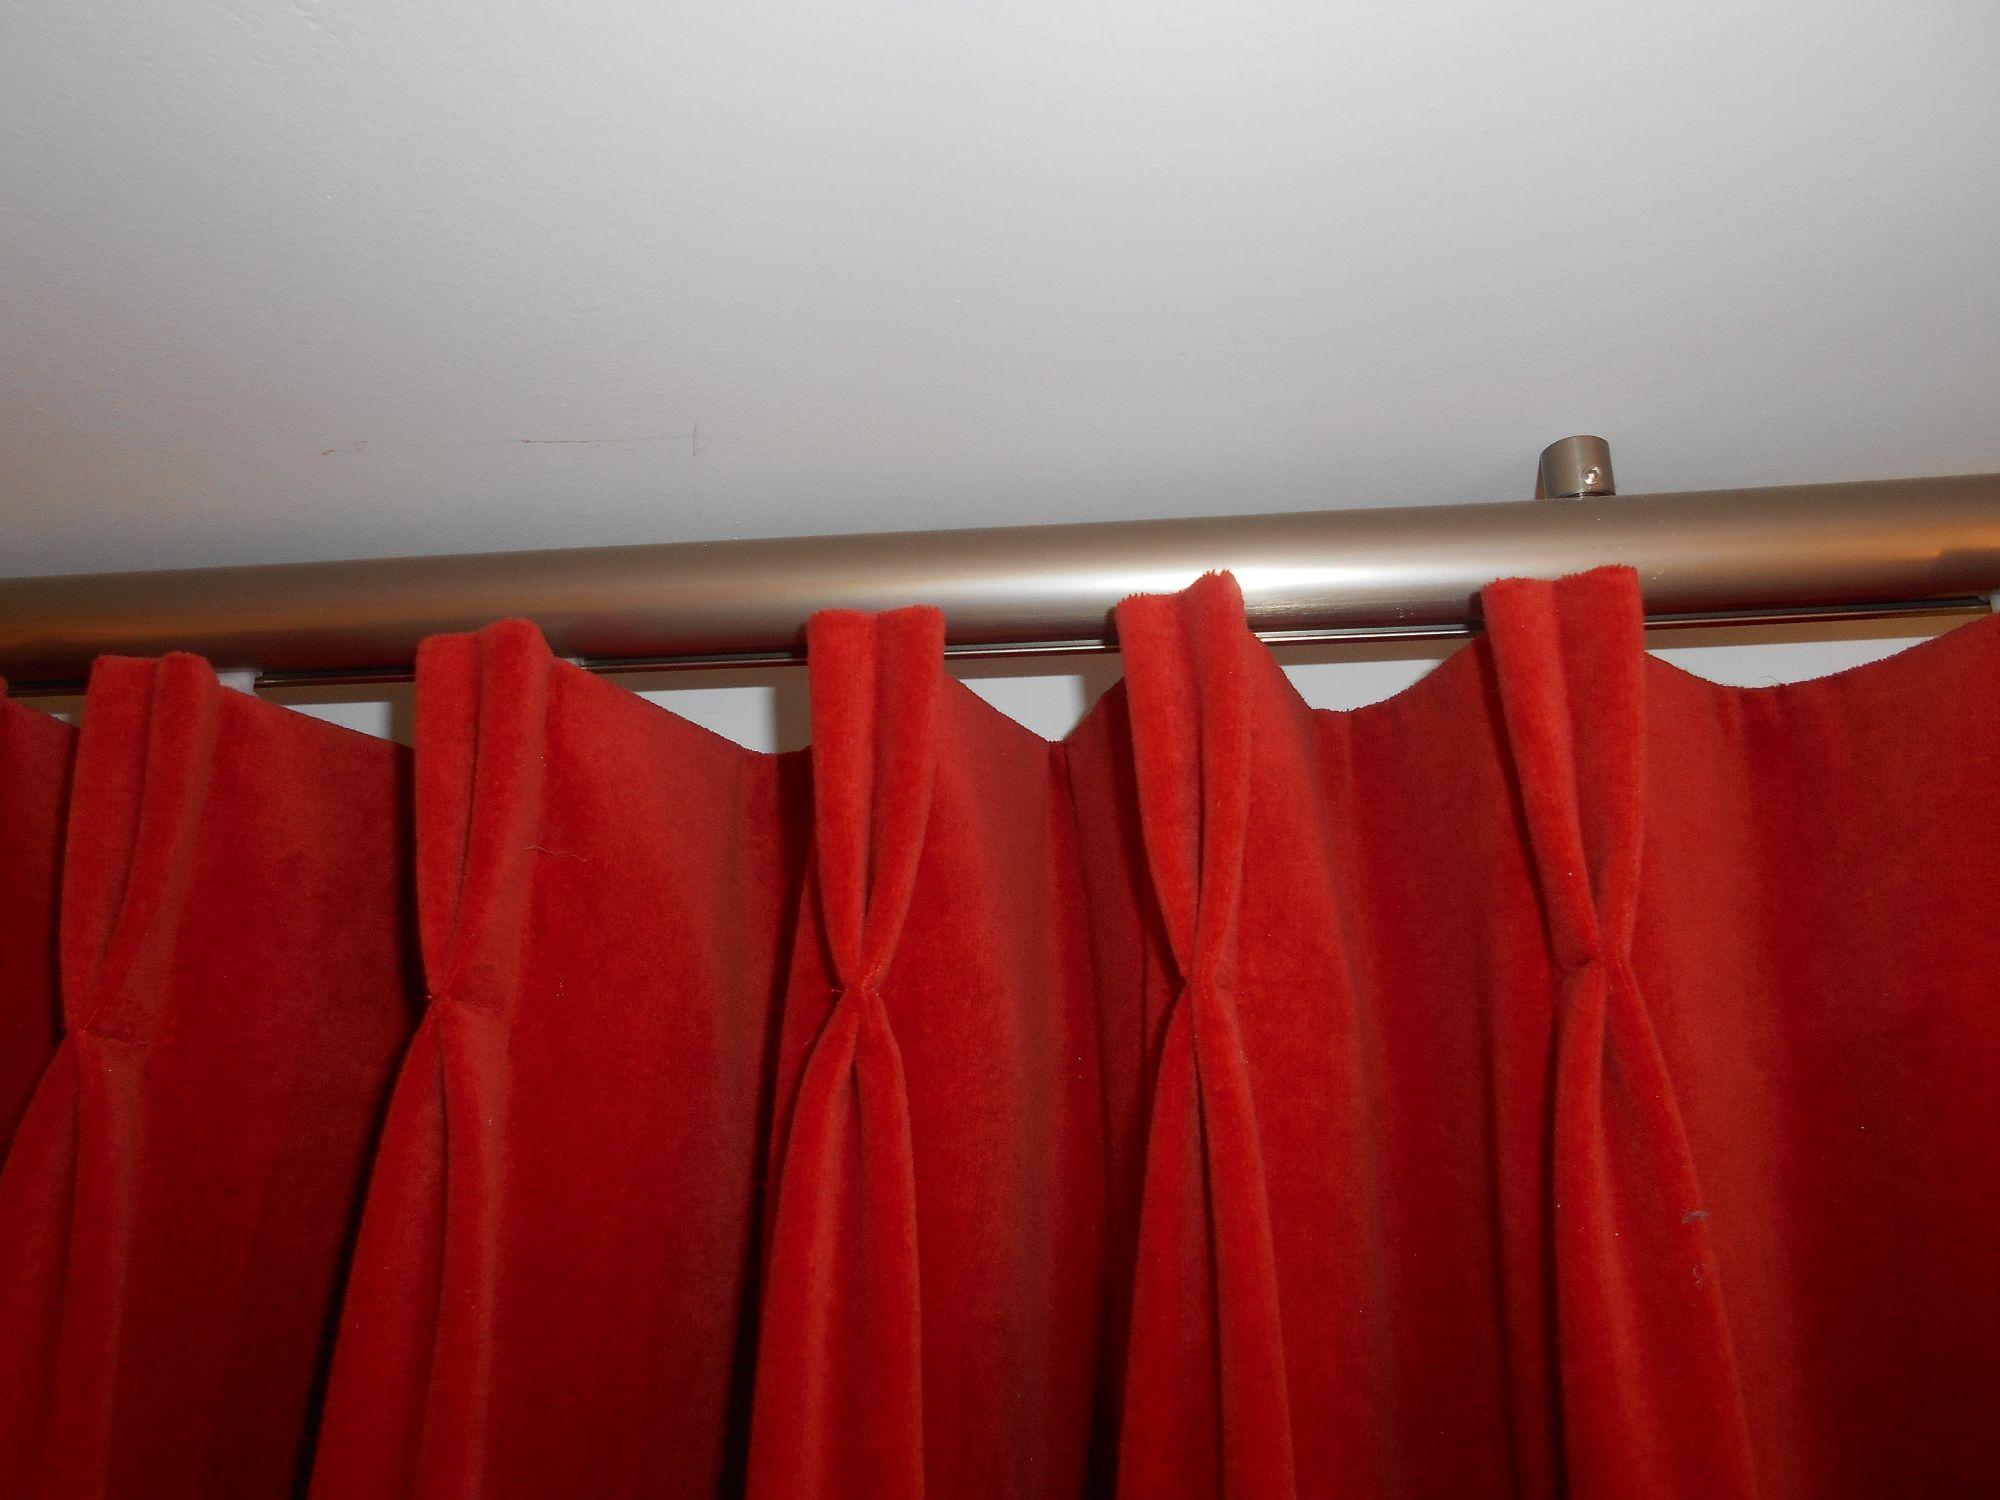 Rode gordijnen